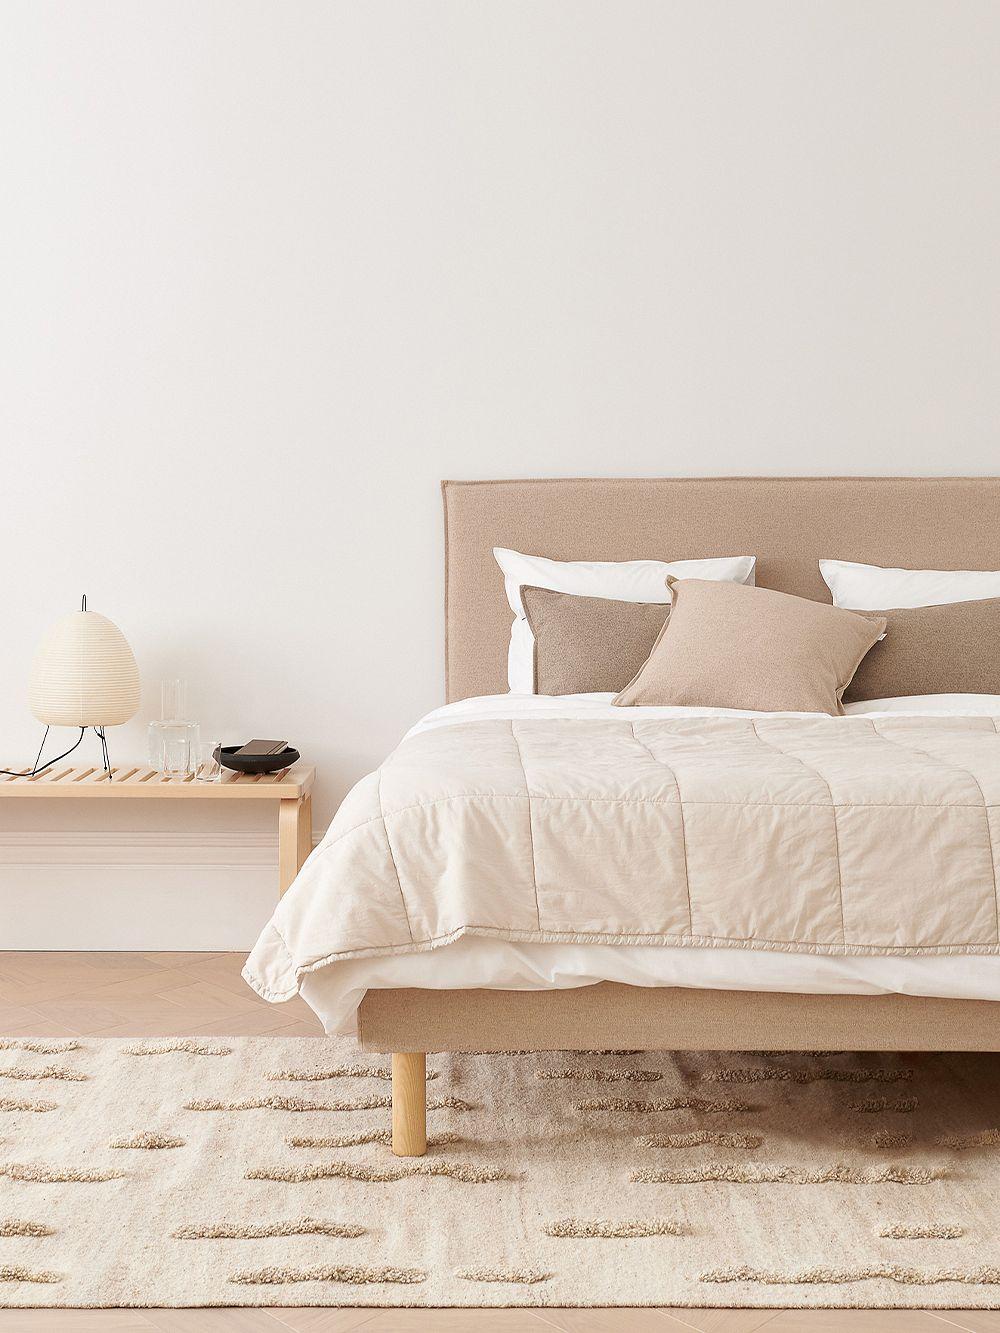 Matri Tuuli bed cover